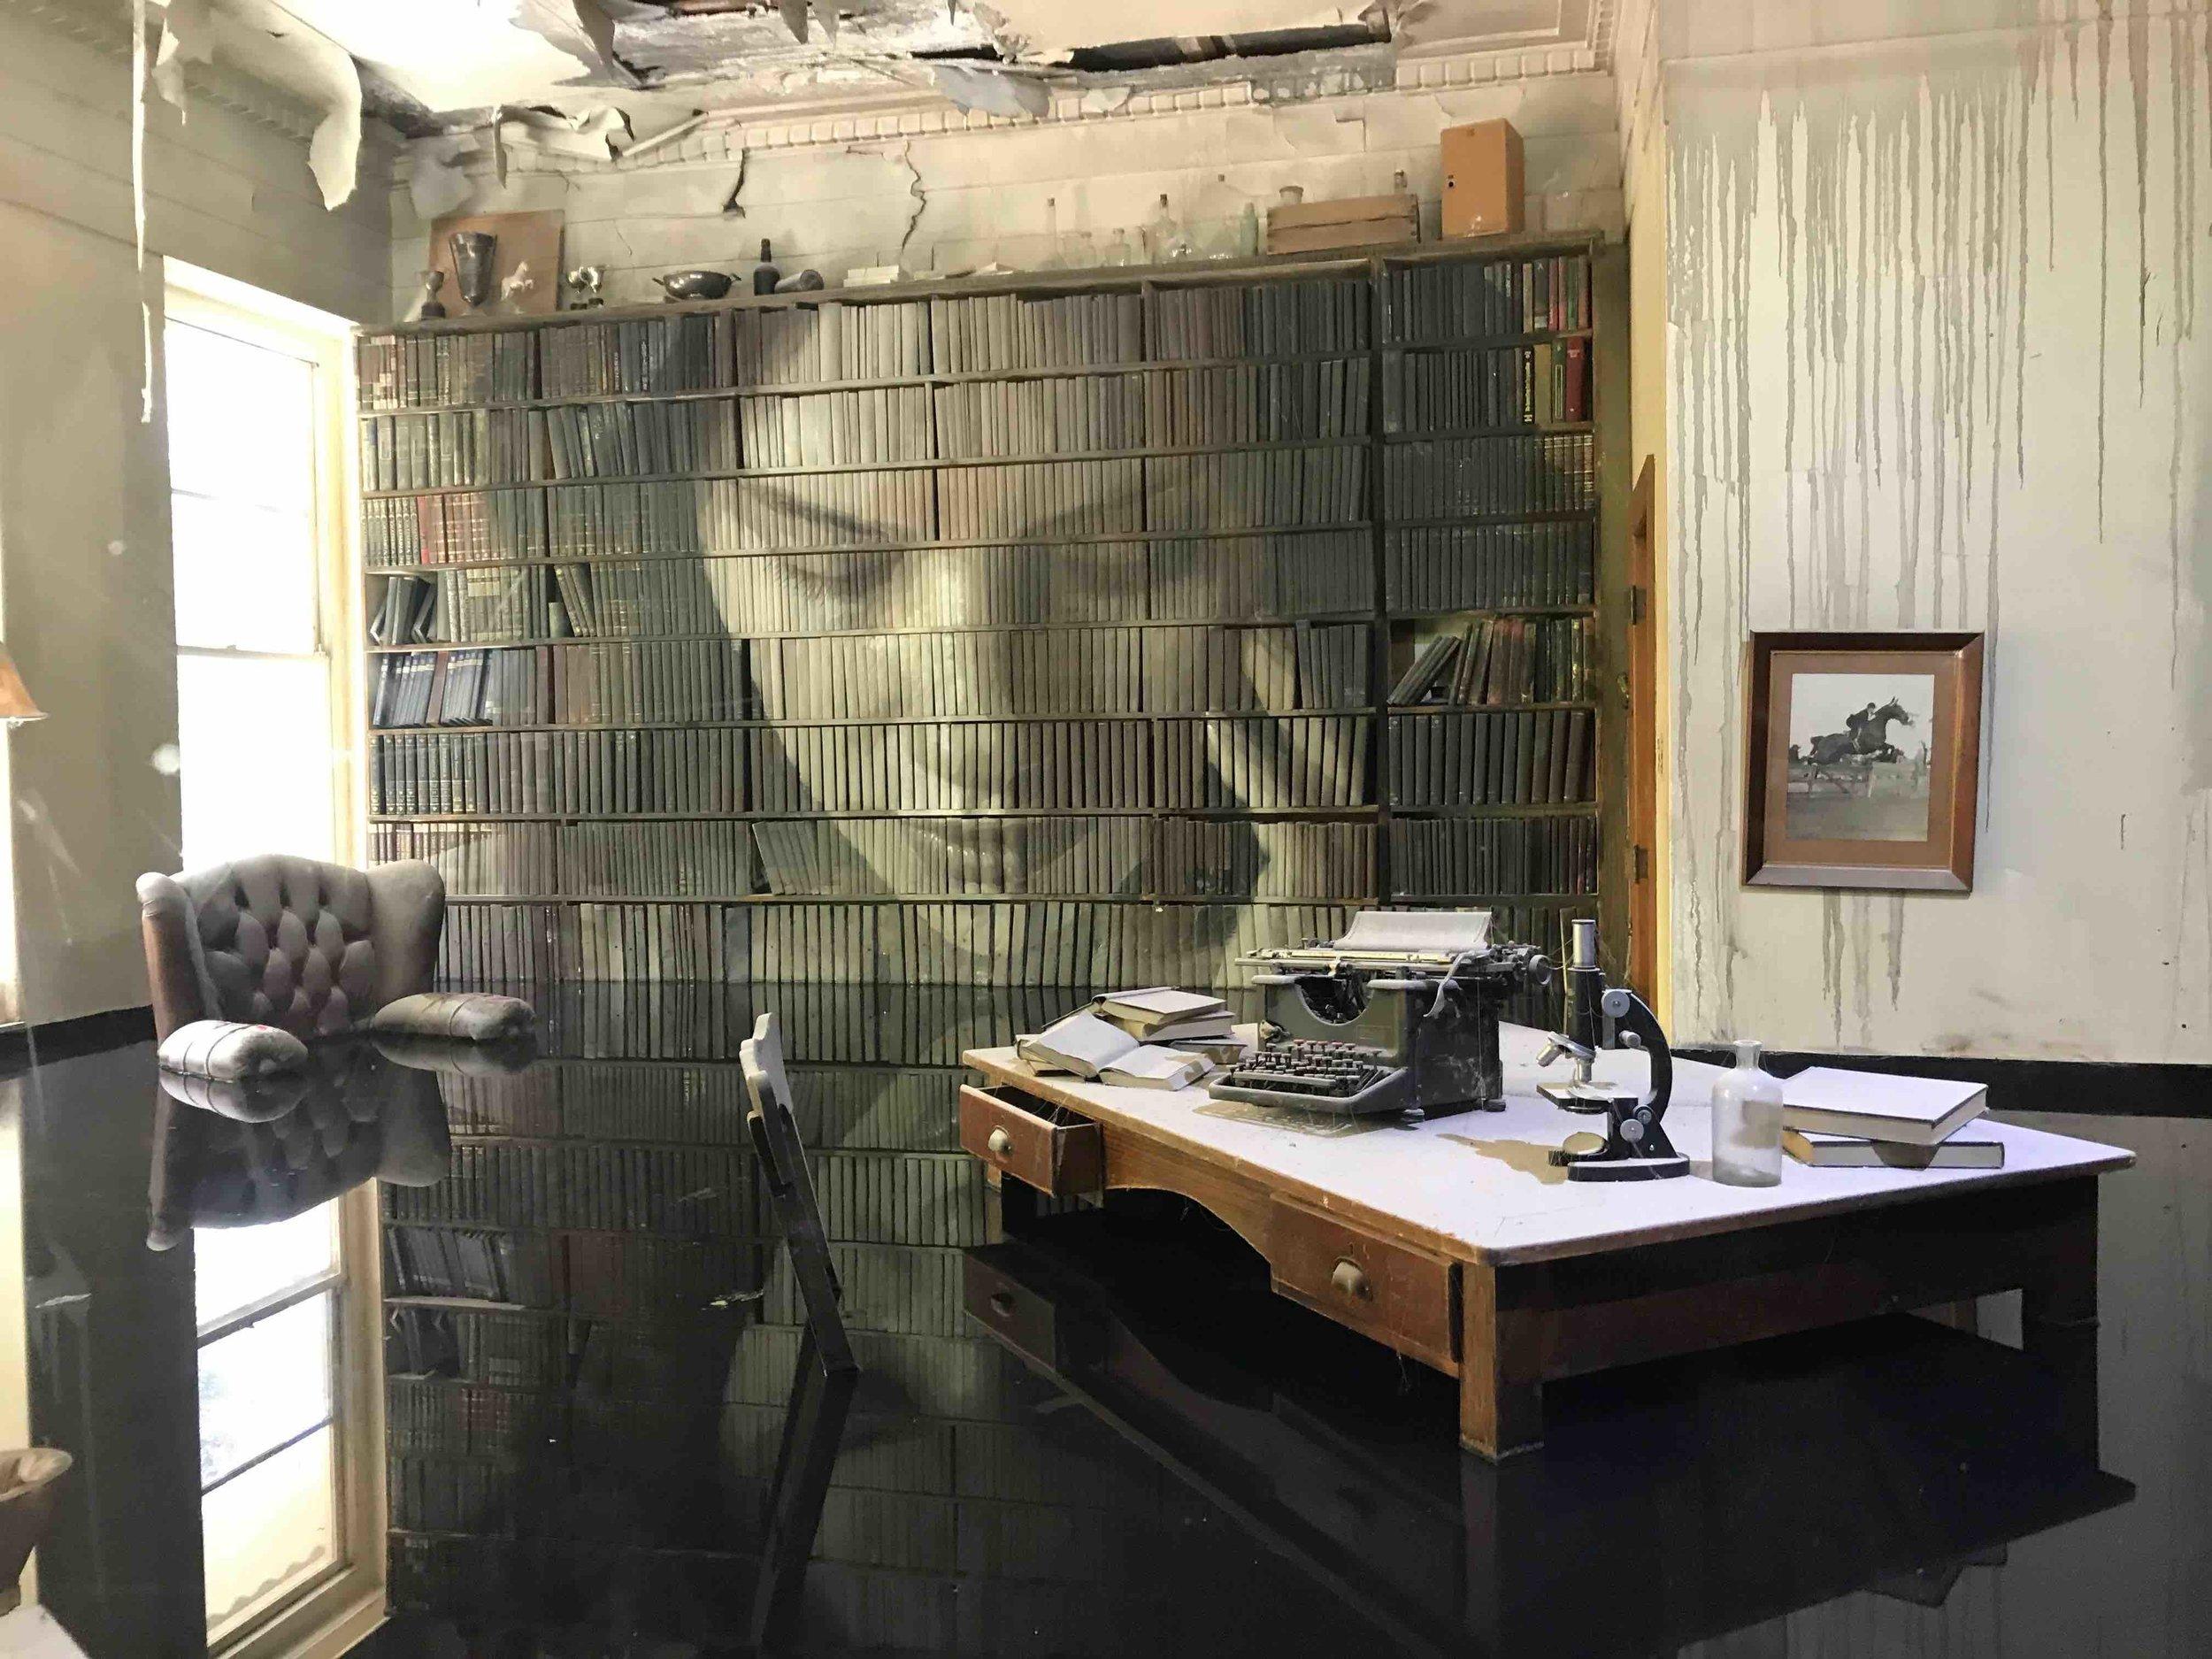 The Study (Photo: Laura Jocic)